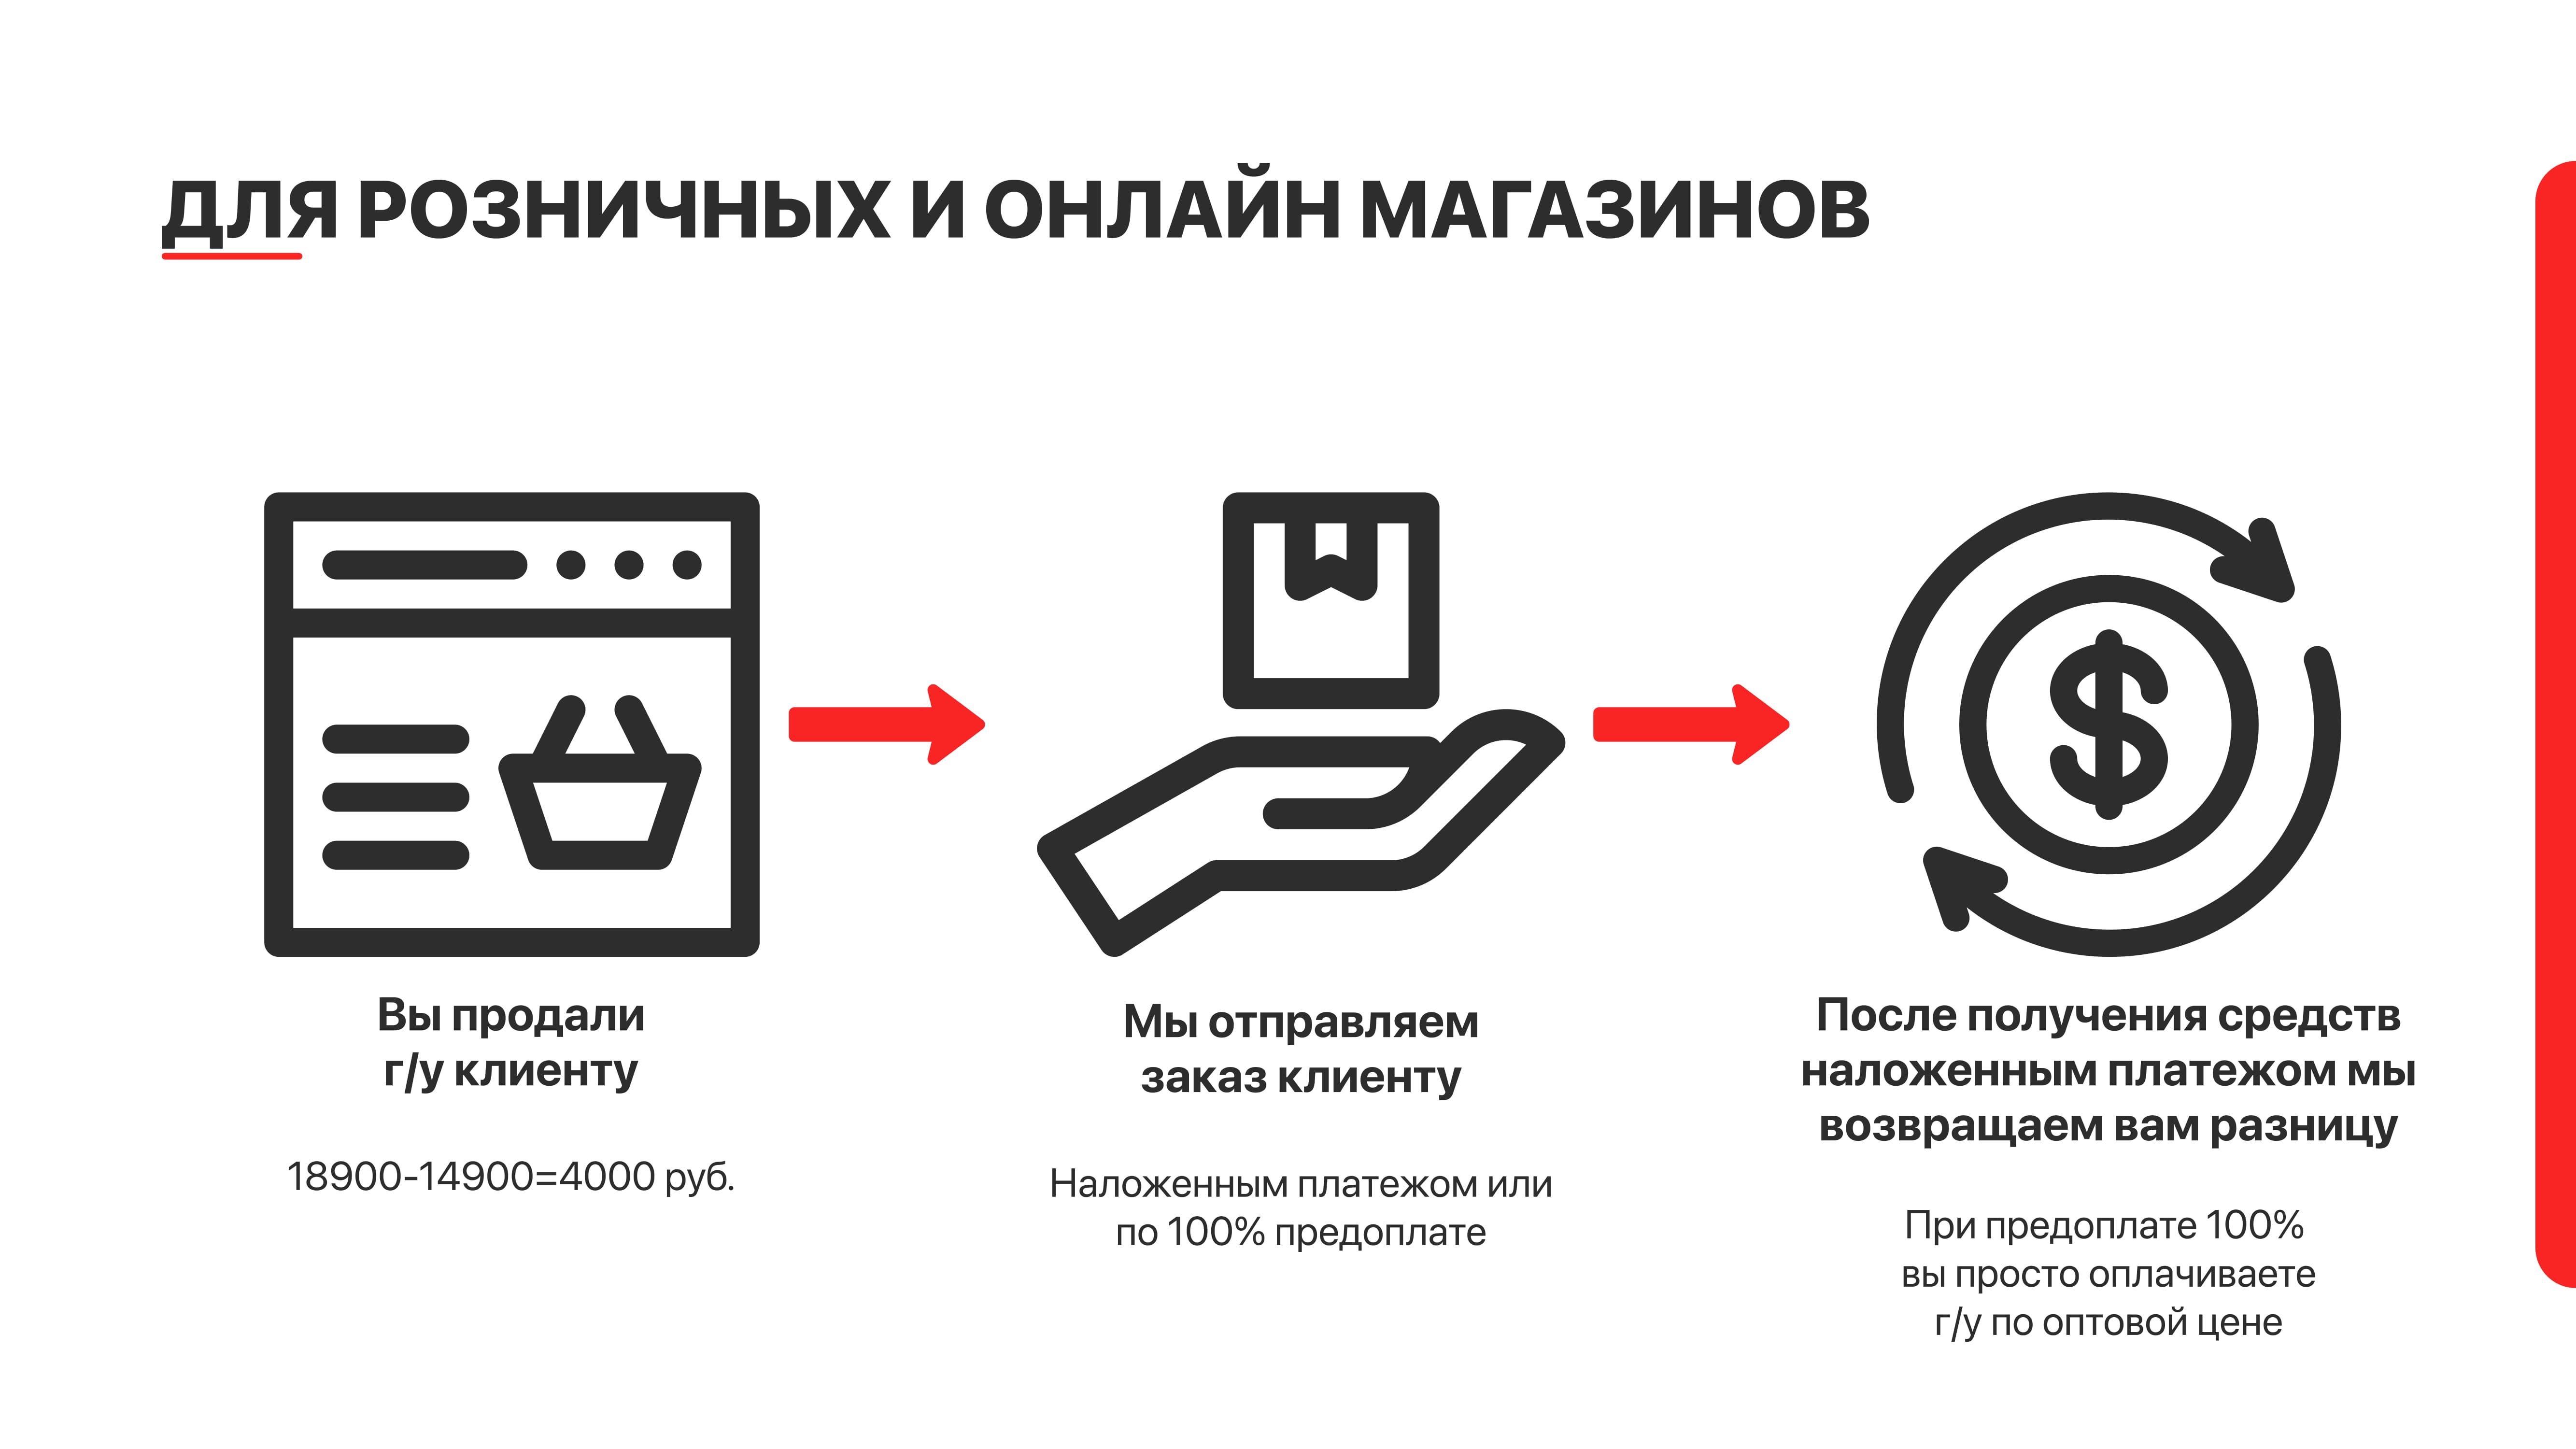 https://audiostart.ru/images/upload/Audio%20Start%20Presentation%20Print-08.jpg